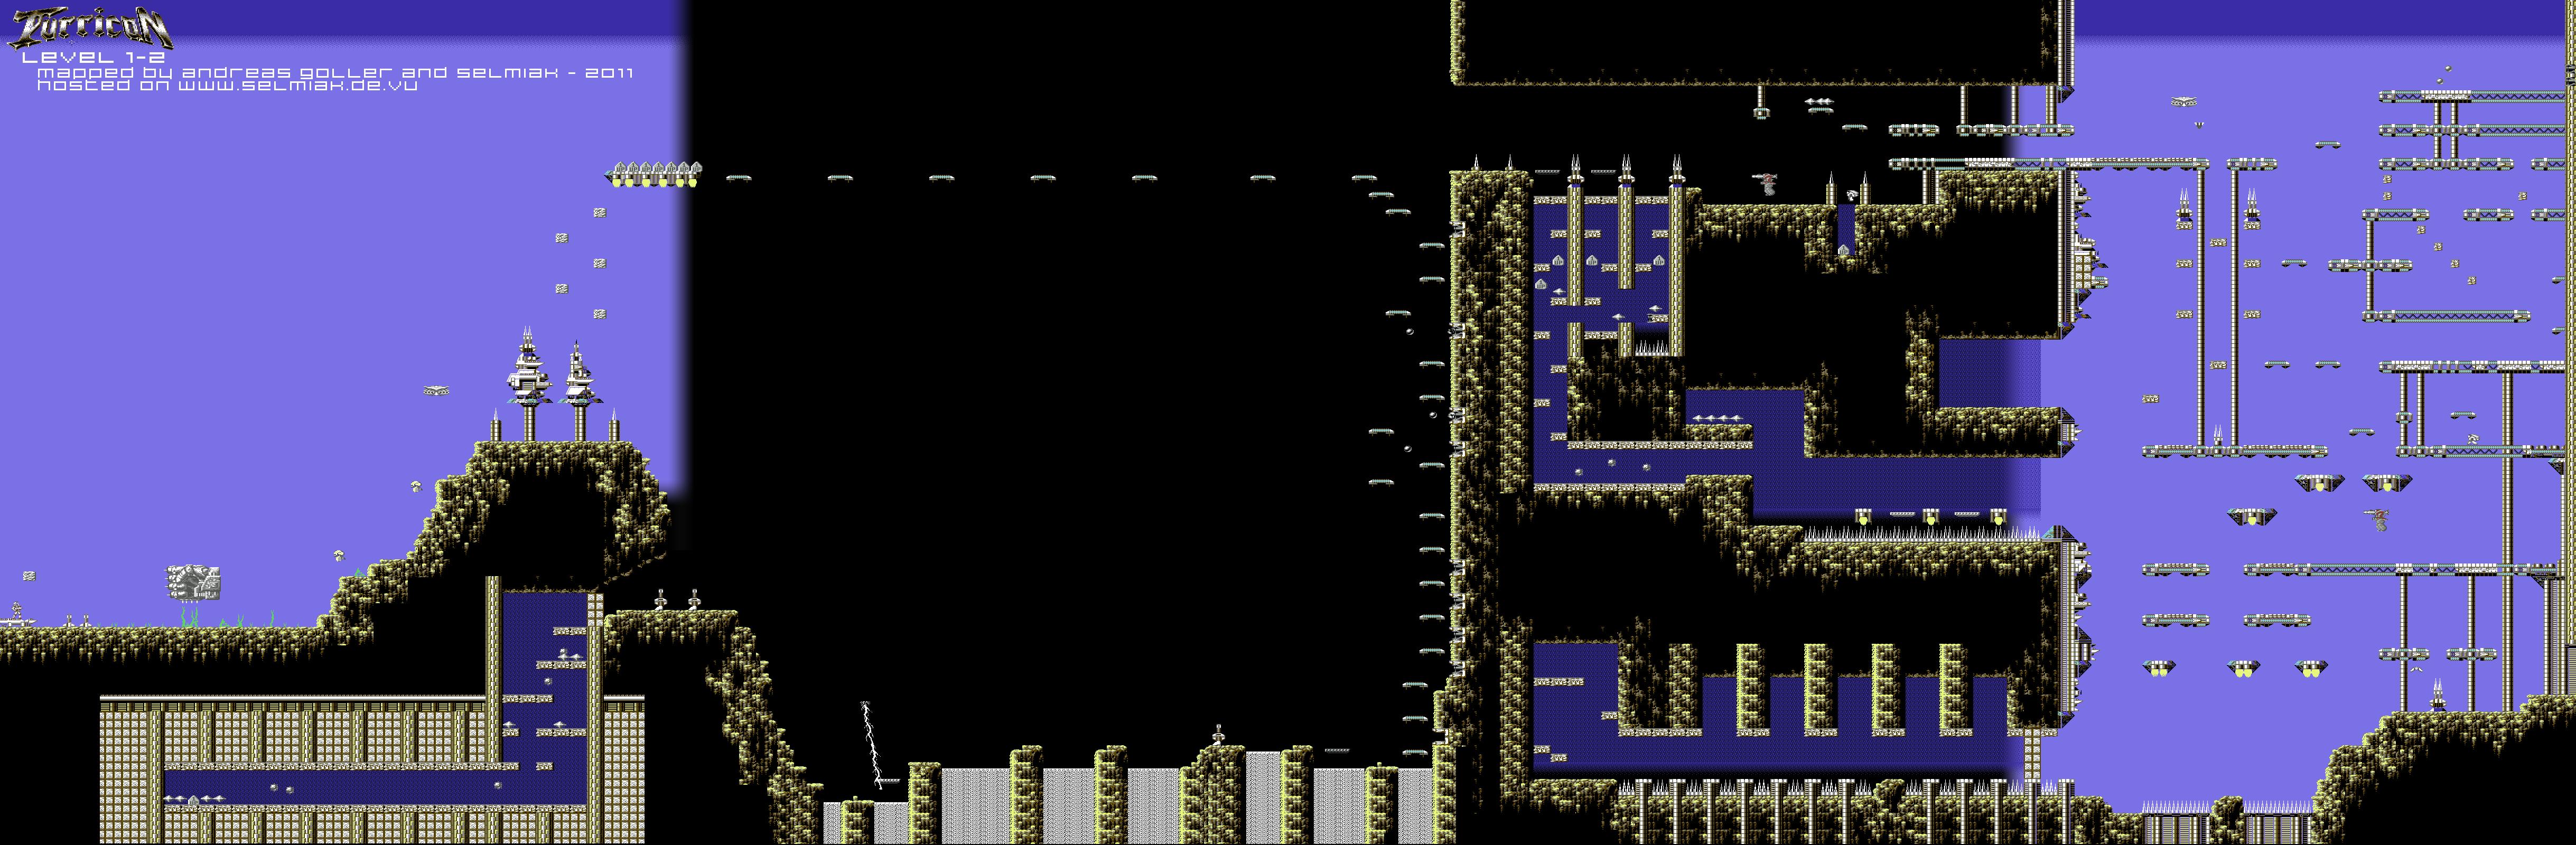 level 1-2